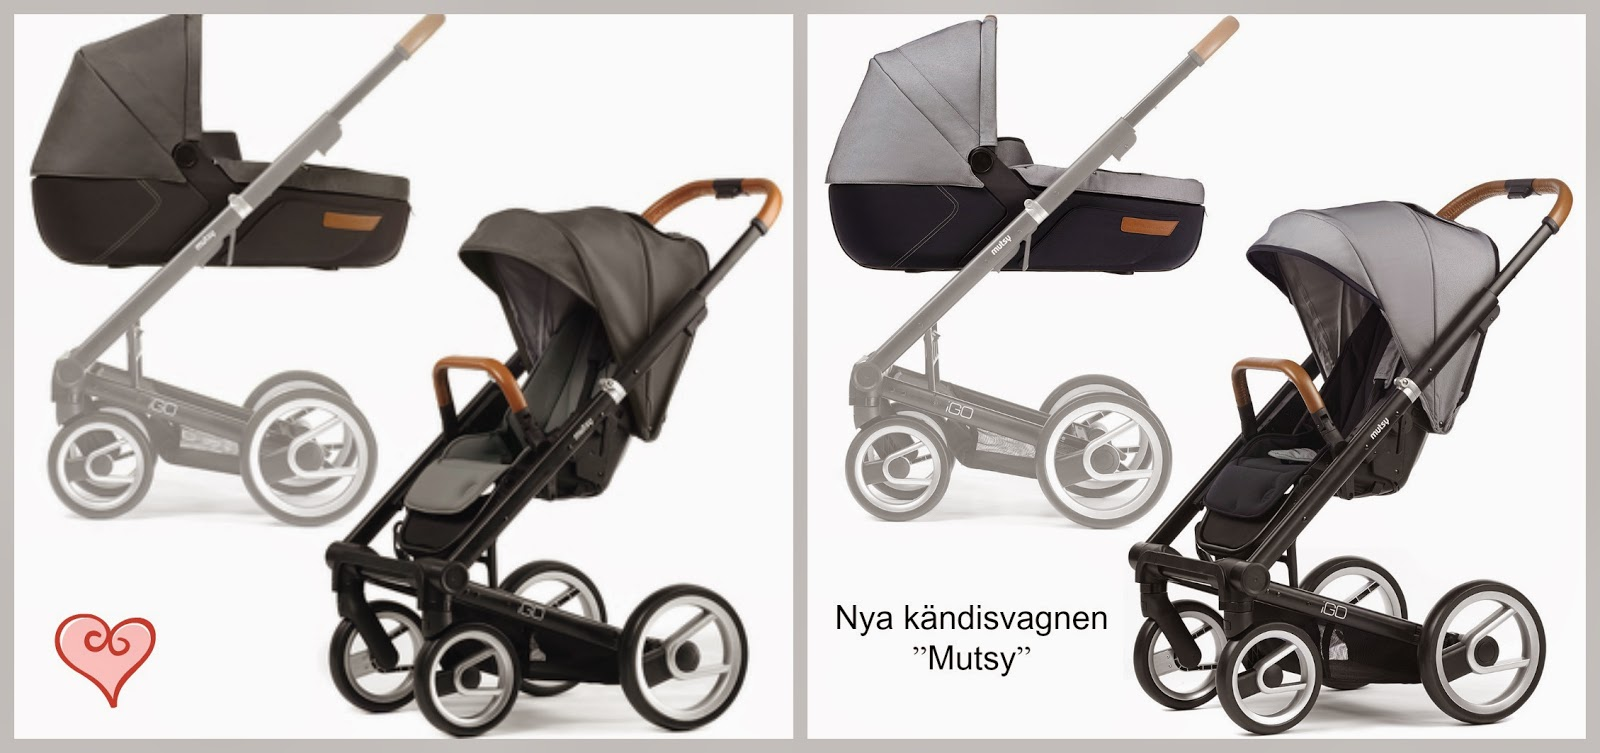 http://www.pinkorblue.se/Paa-vaeg/Mutsy-IGO-Komplett-kombivagn-Black-Dark-Grey-URBAN-NOMAD-Edidion-1.html